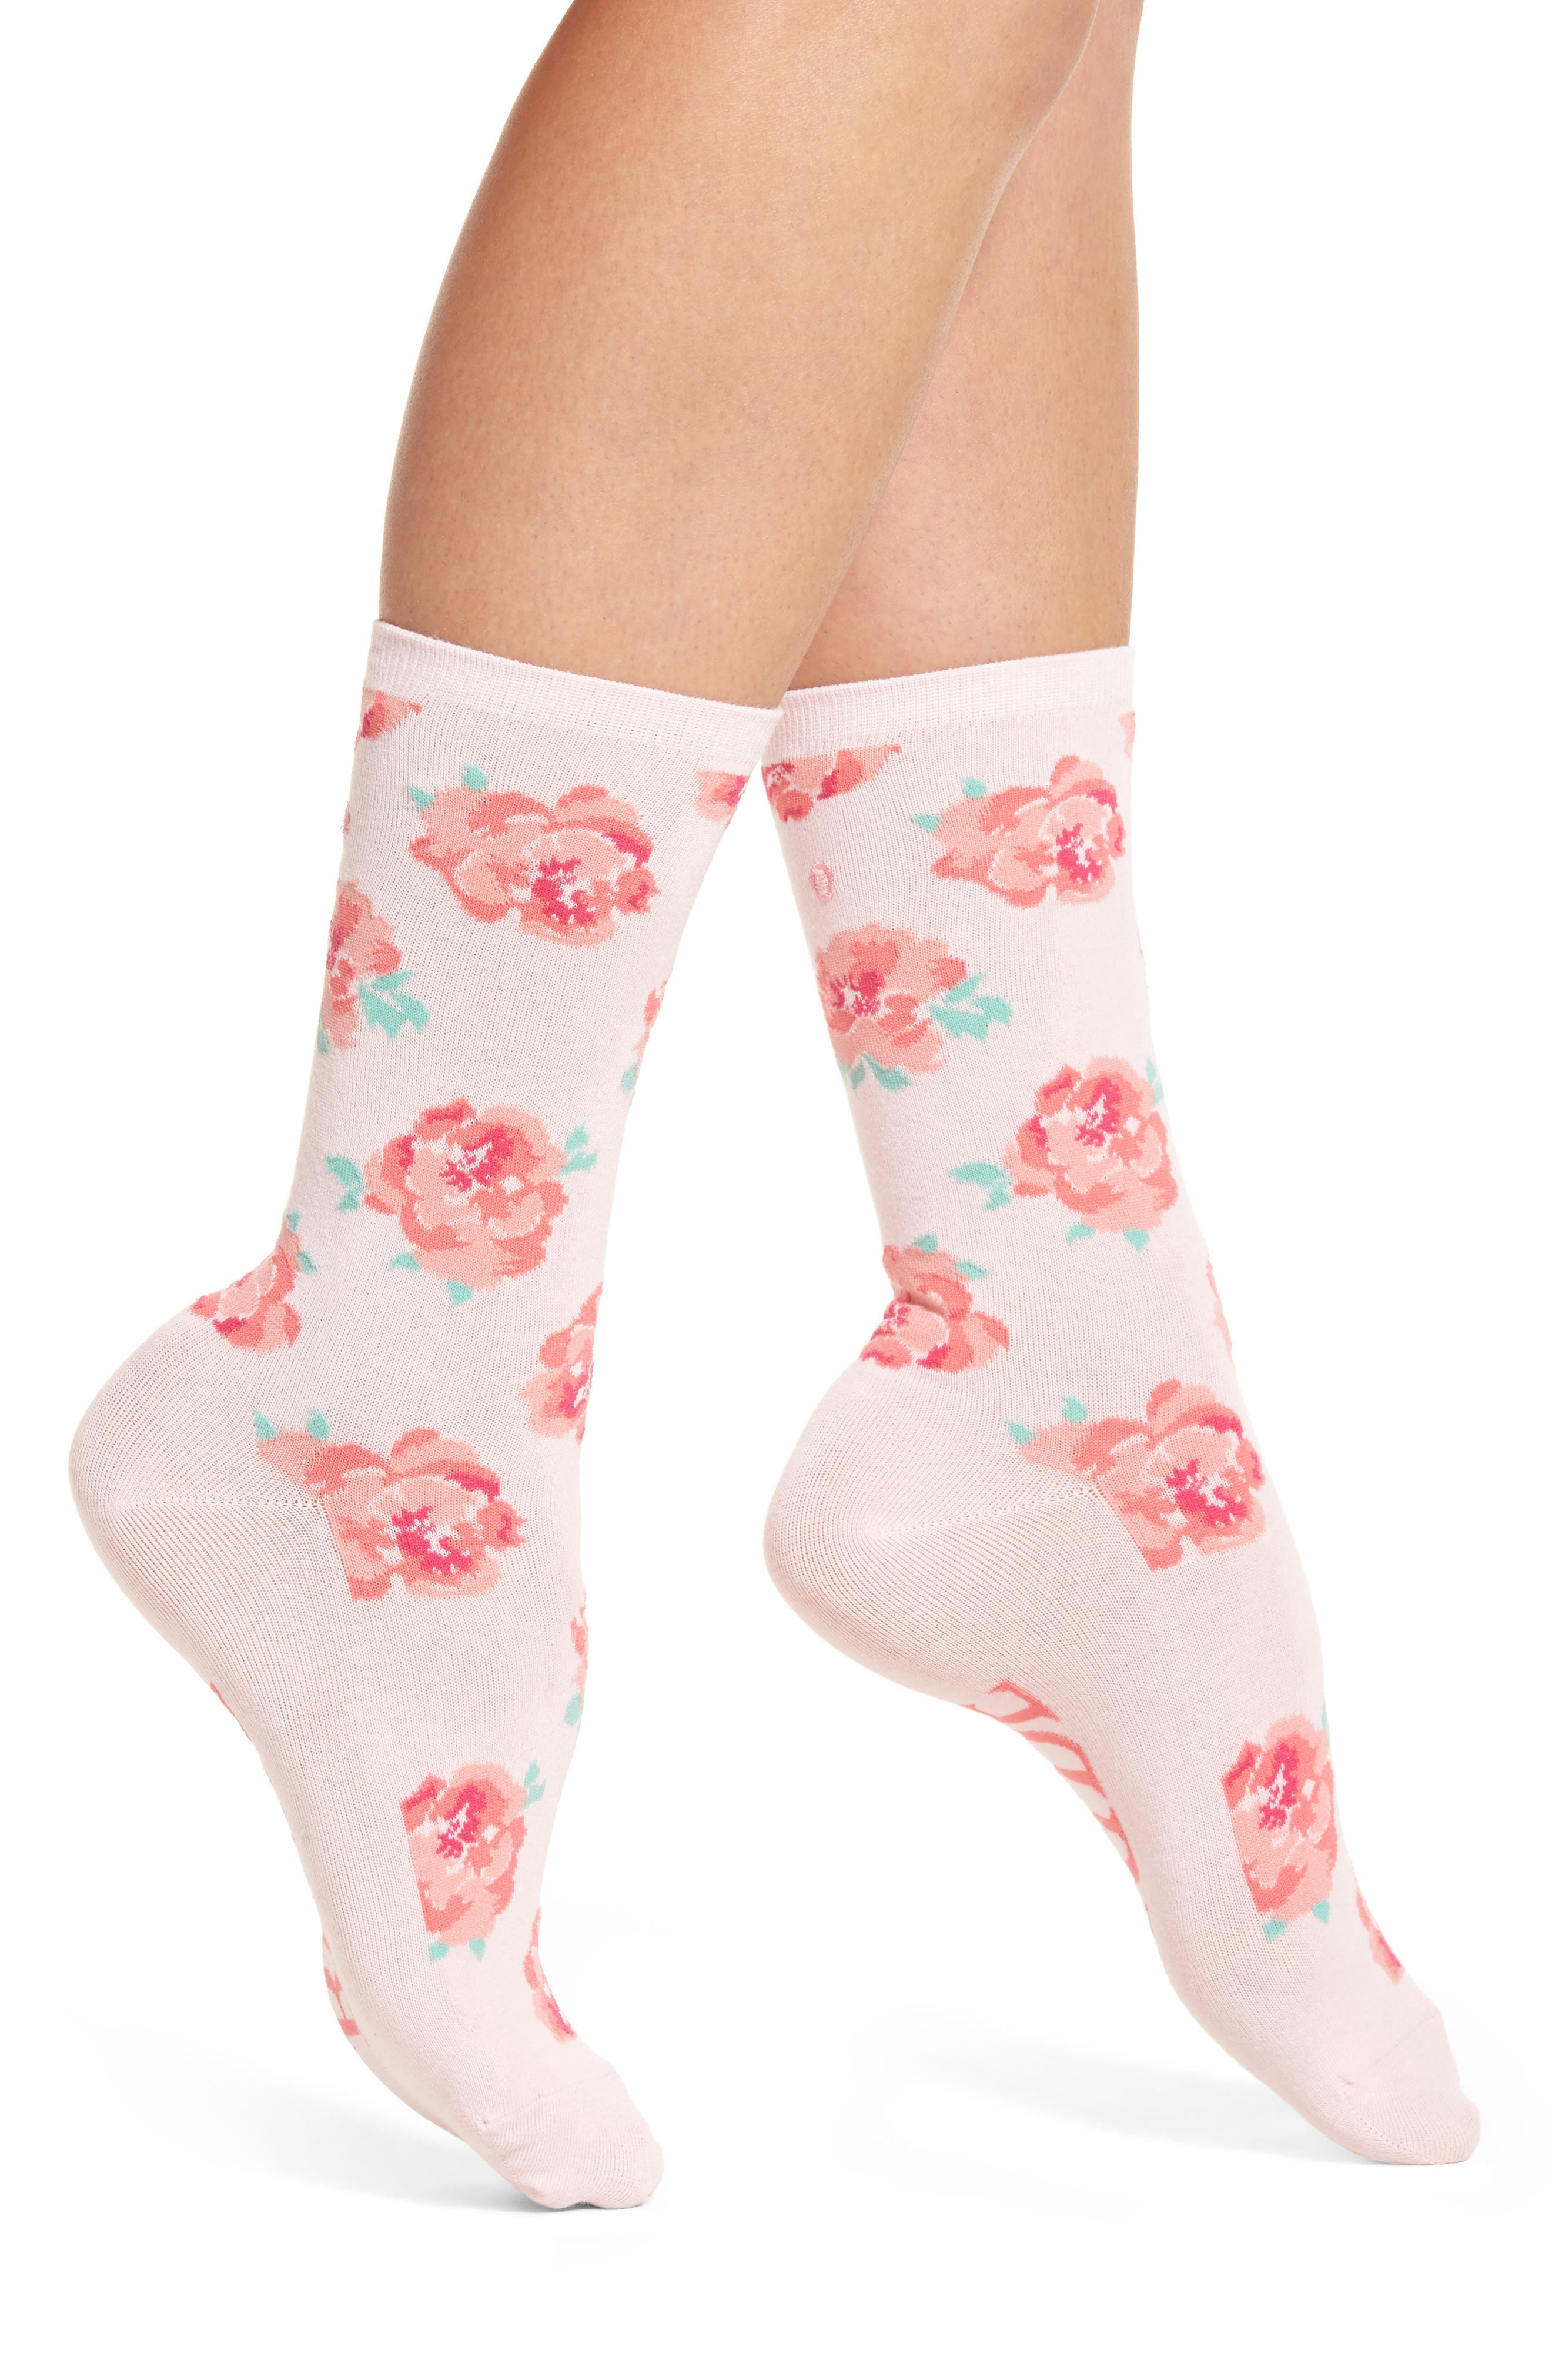 Bride Crew Socks,                             Main thumbnail 1, color,                             680